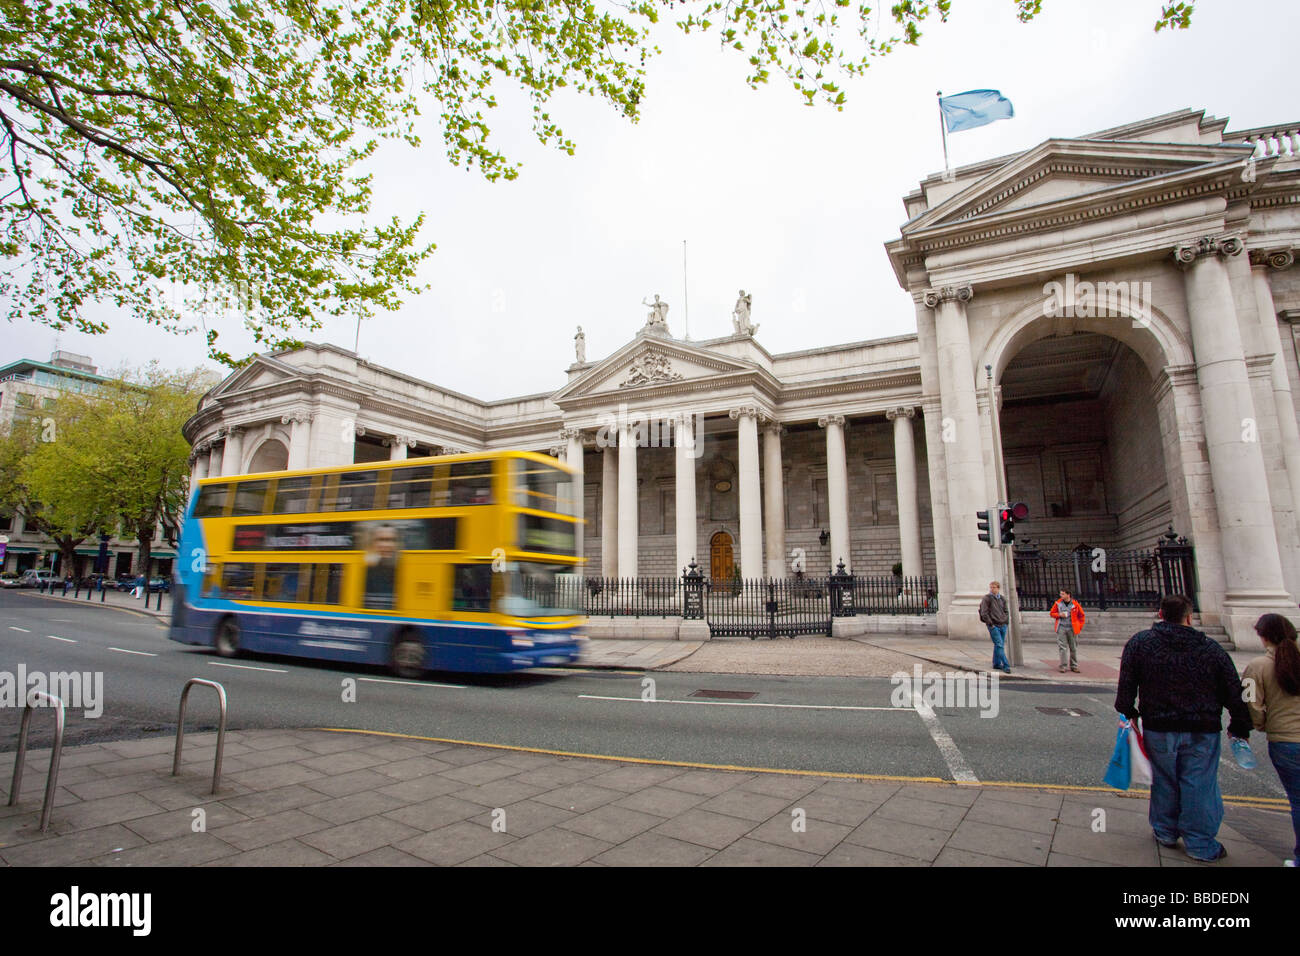 Bank of Ireland building College Green Dublin Ireland Eire Irish Republic Europe - Stock Image